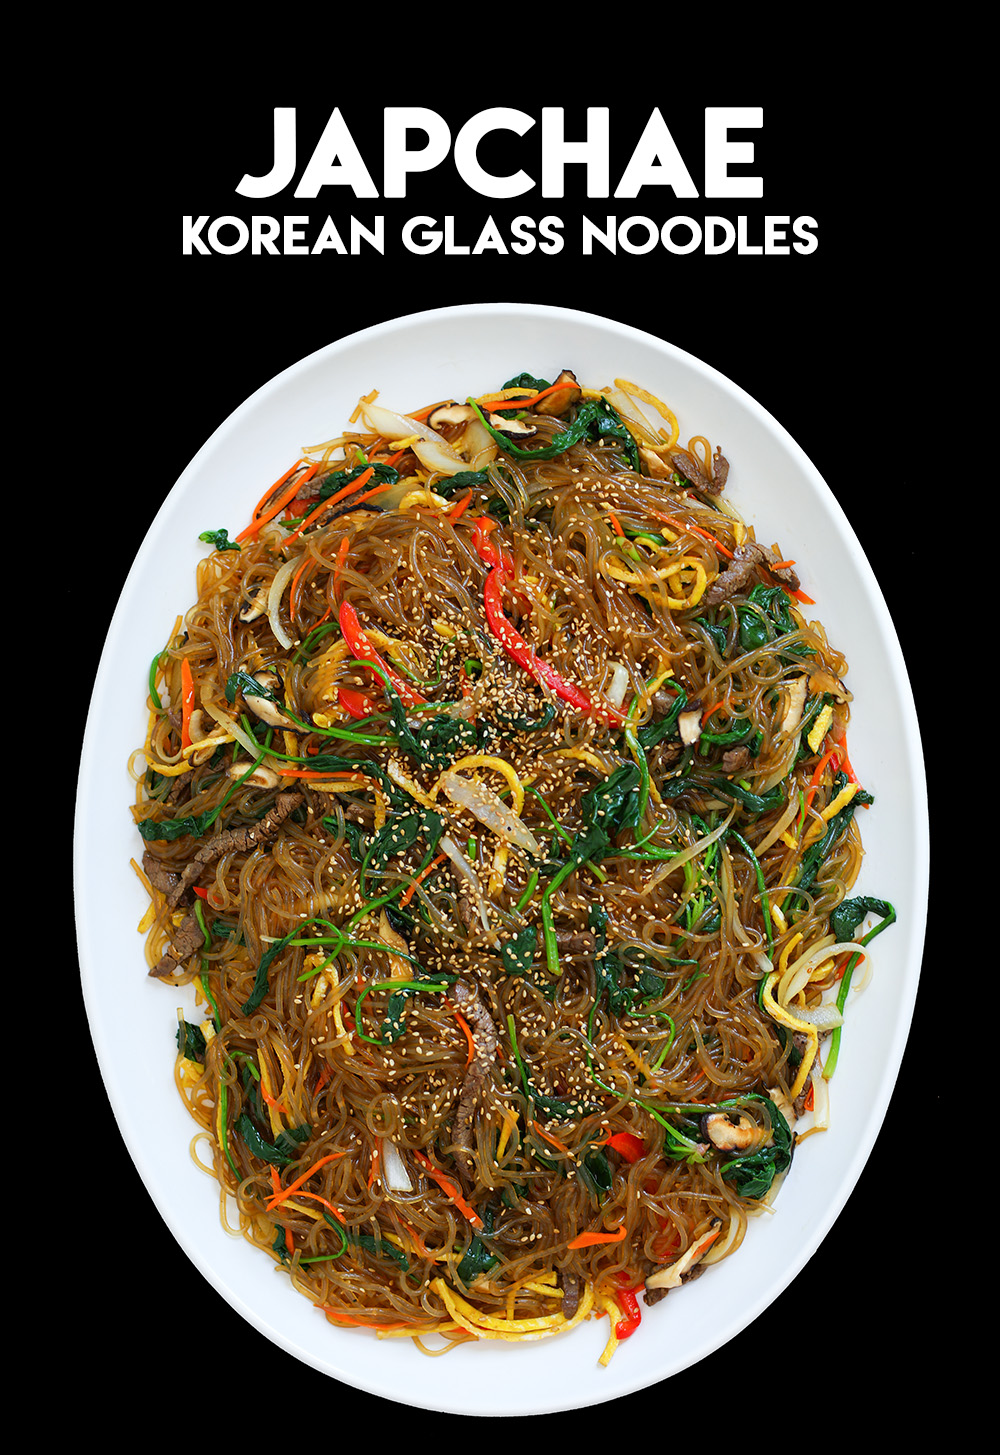 japchae recipe video Japchae Korean Glass Noodles